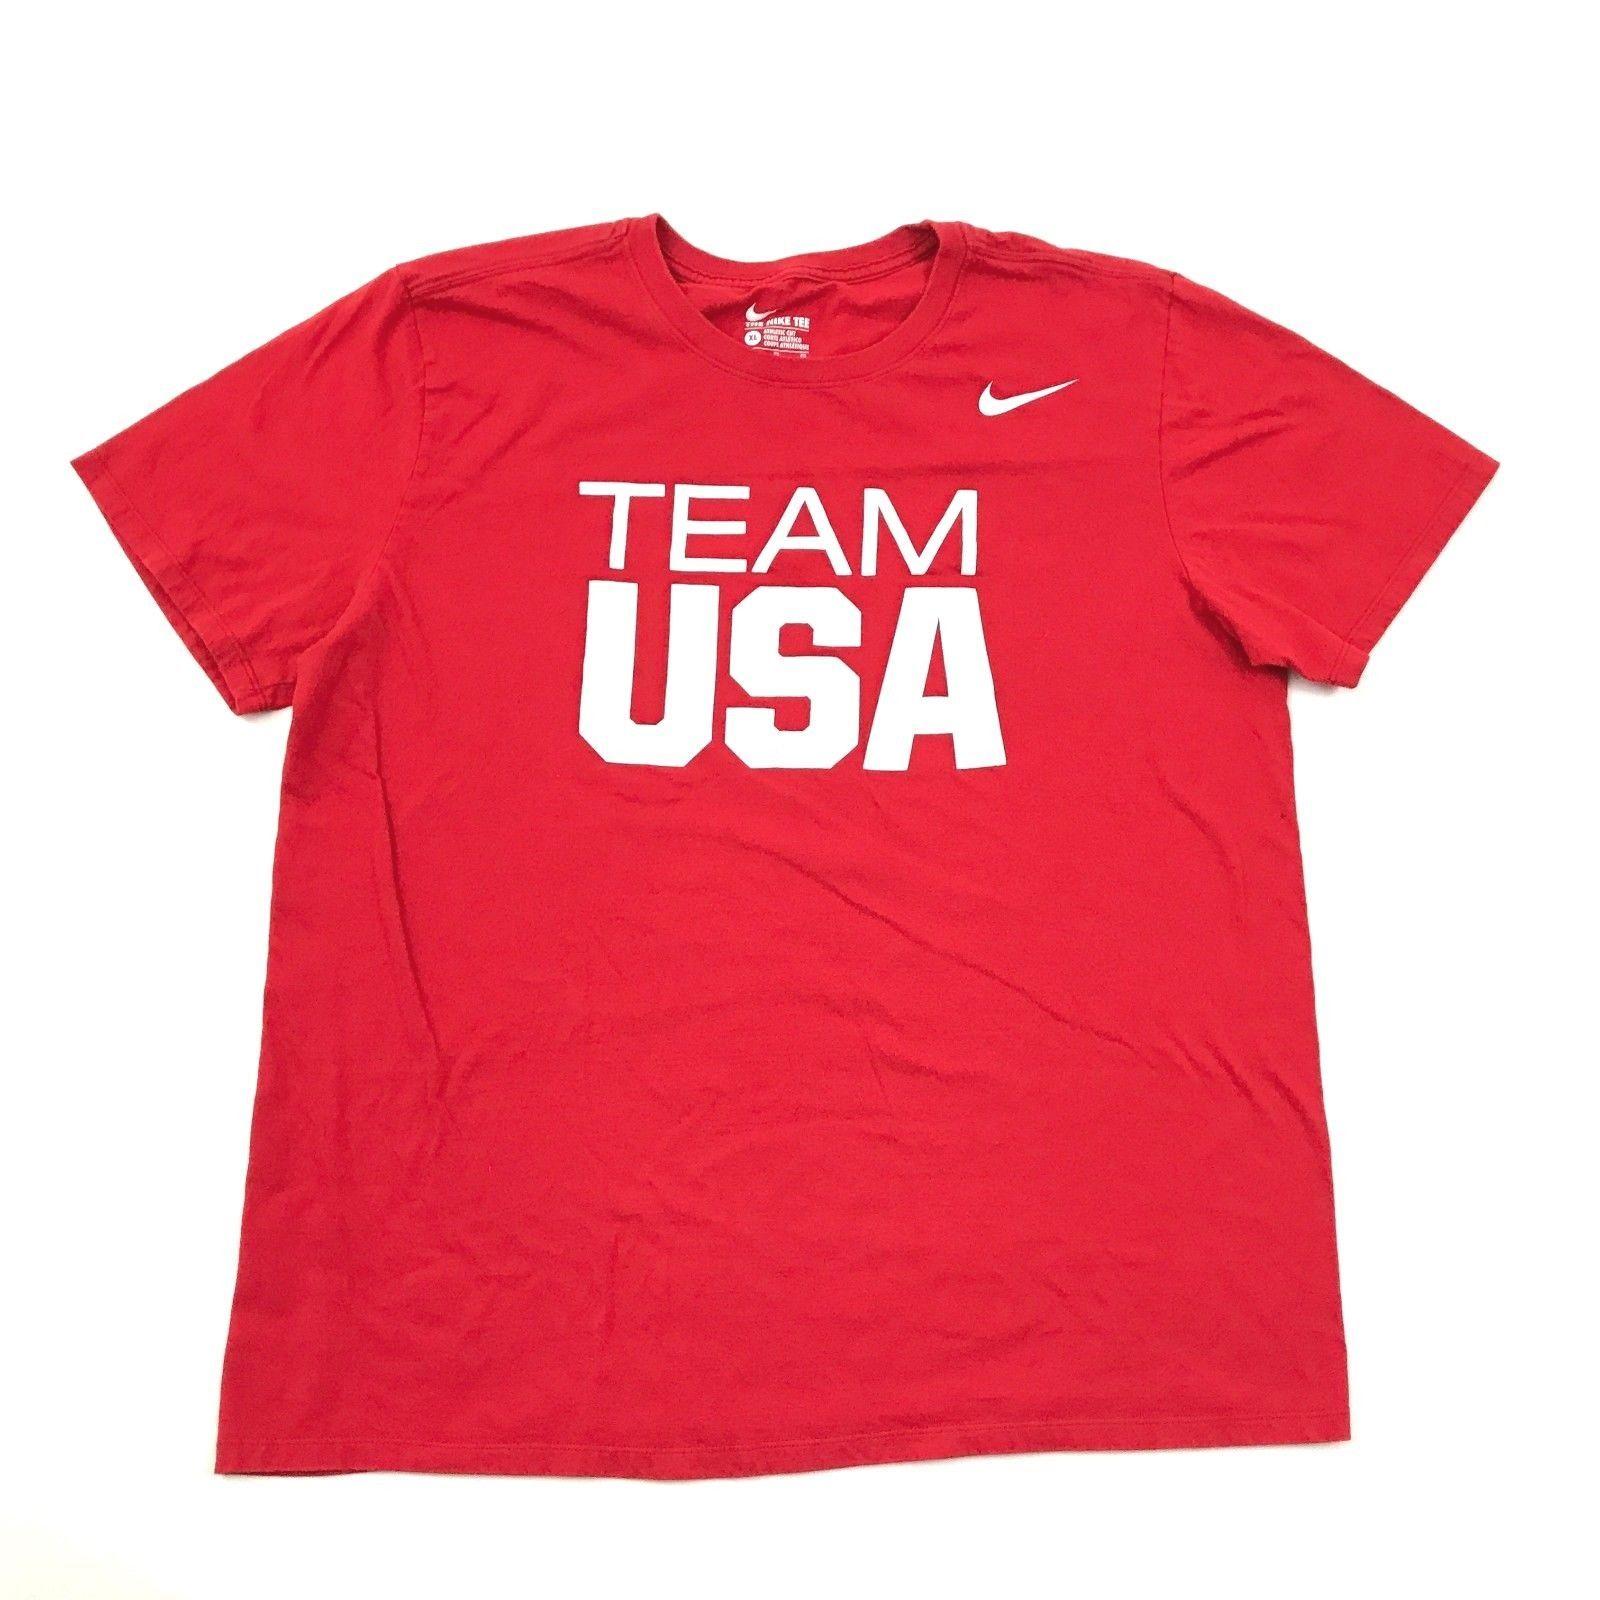 Nike Équipe USA T Shirt Adulte Extra Large and 50 similar items